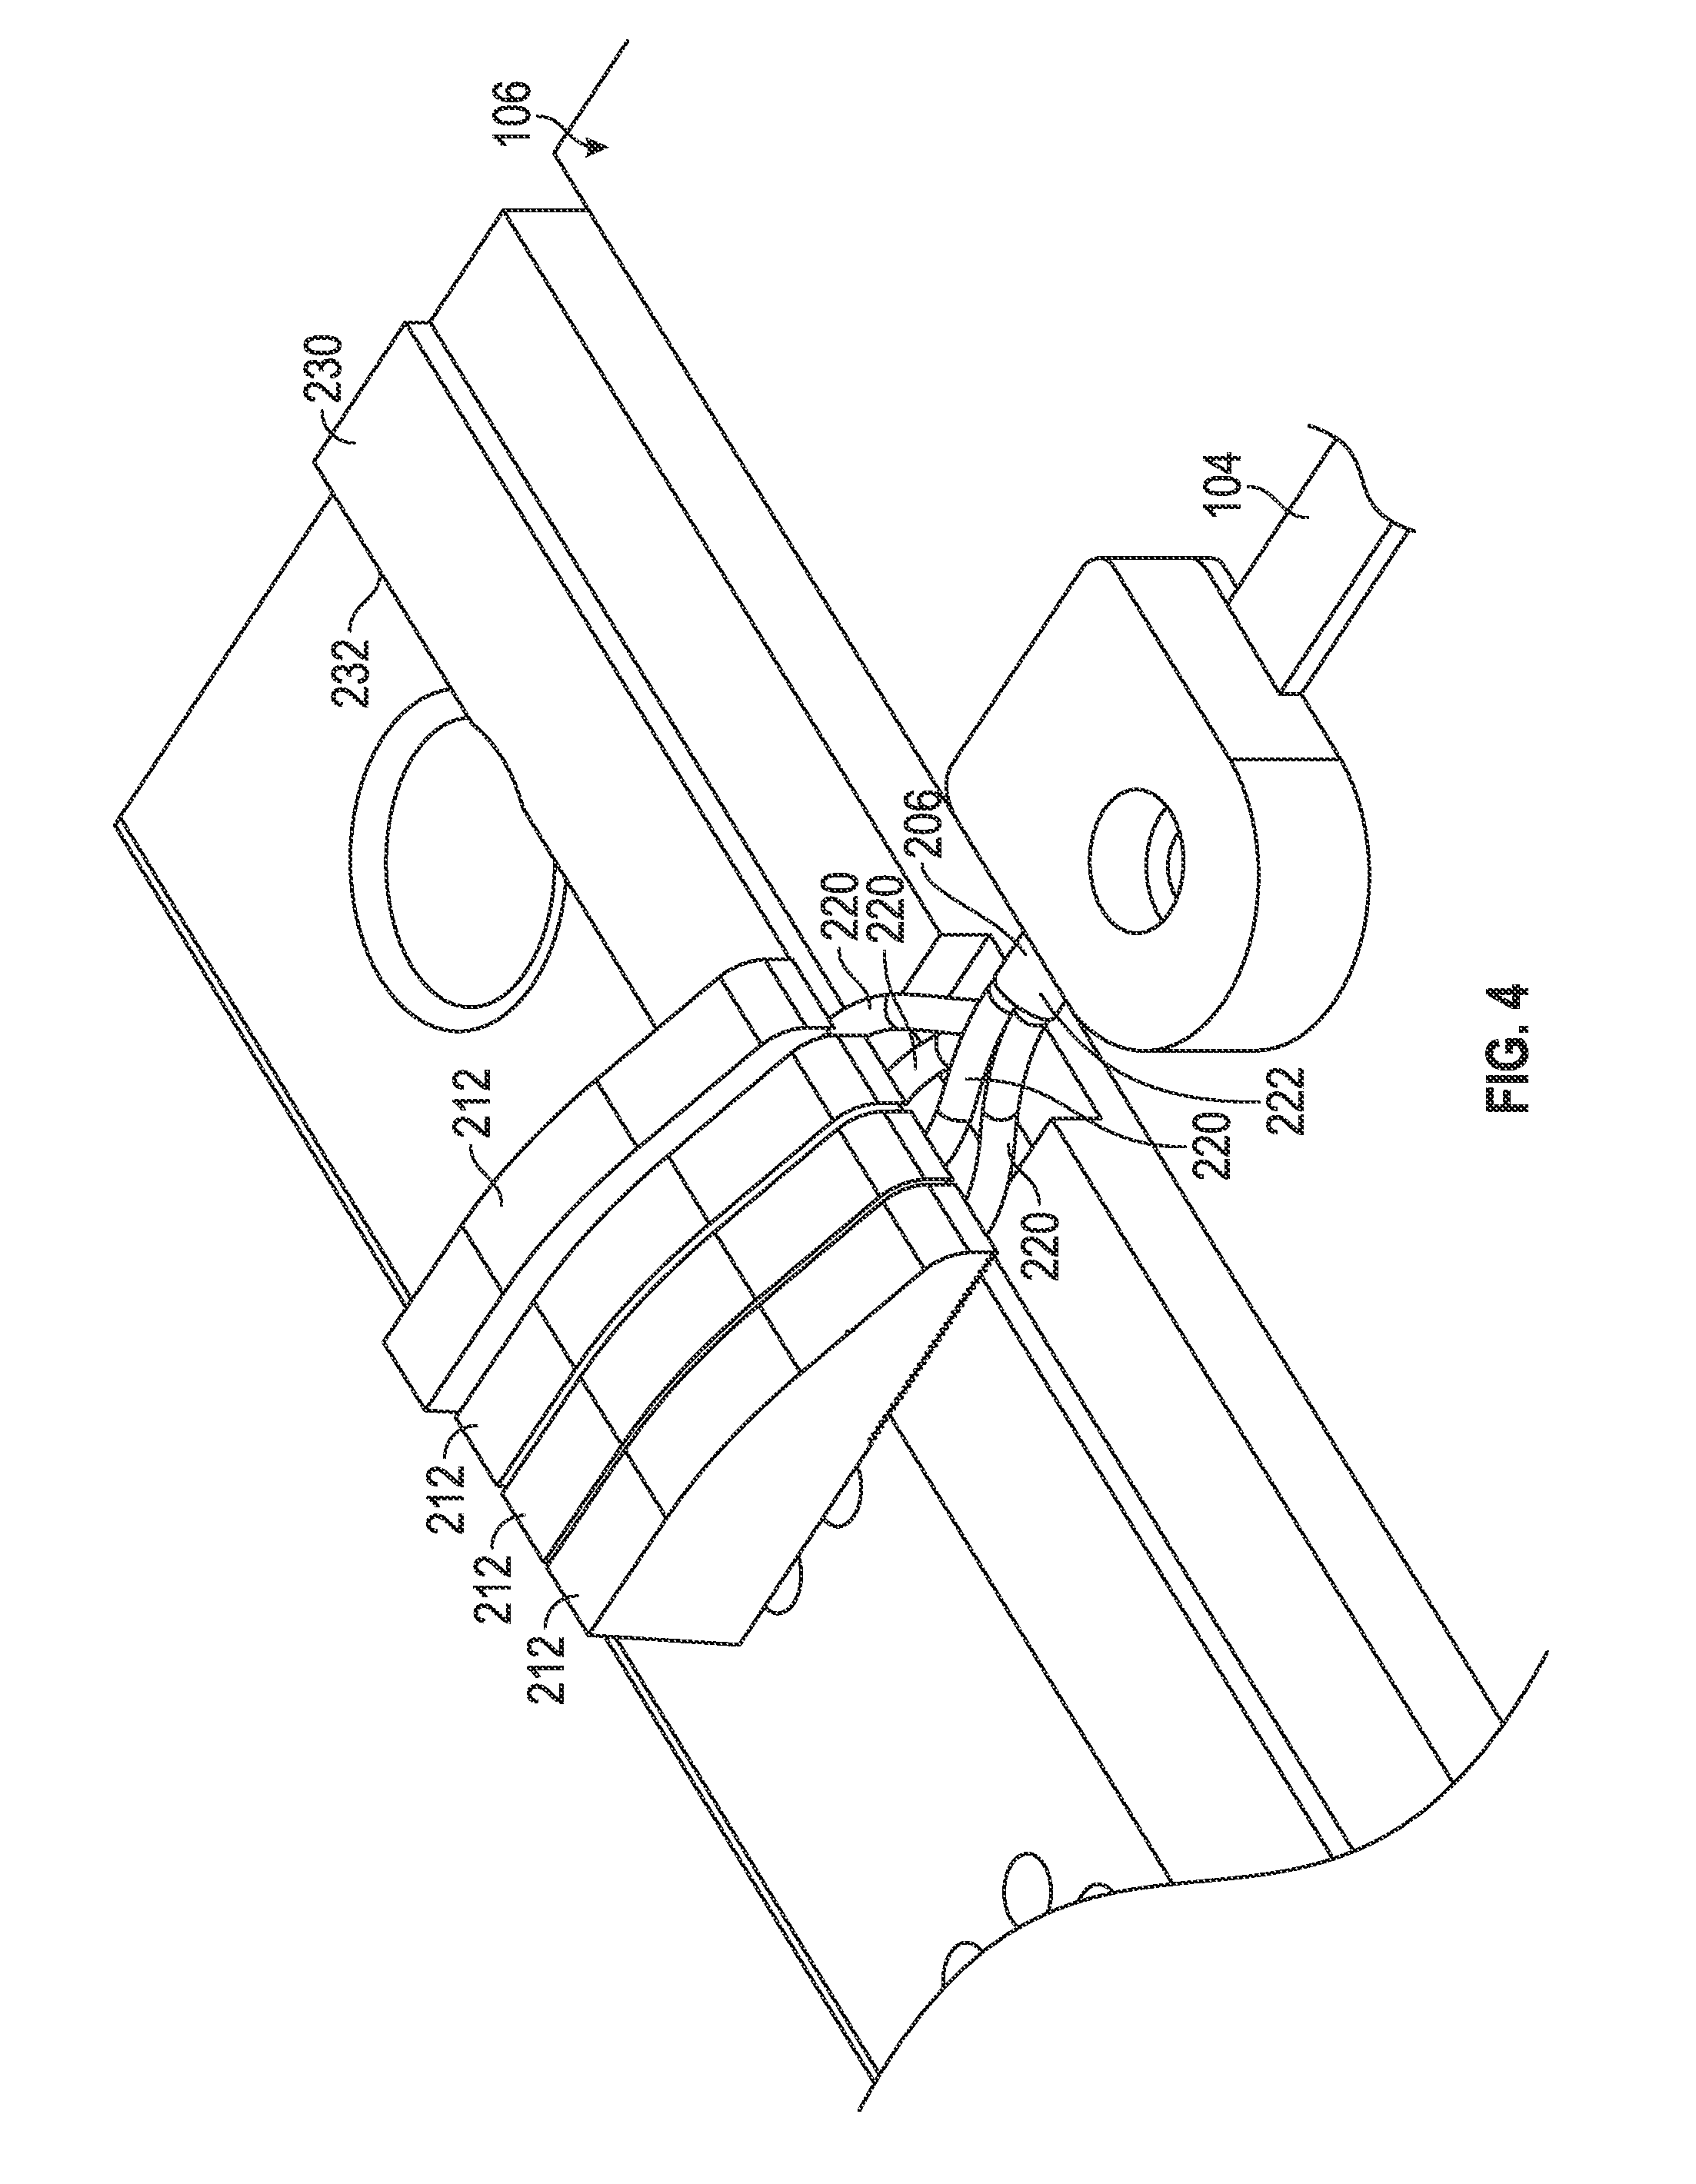 Pixhawk 2 1 Wiring Diagram And Engine Dji Phantom Apm 8 Besides Schematic Bit Counter